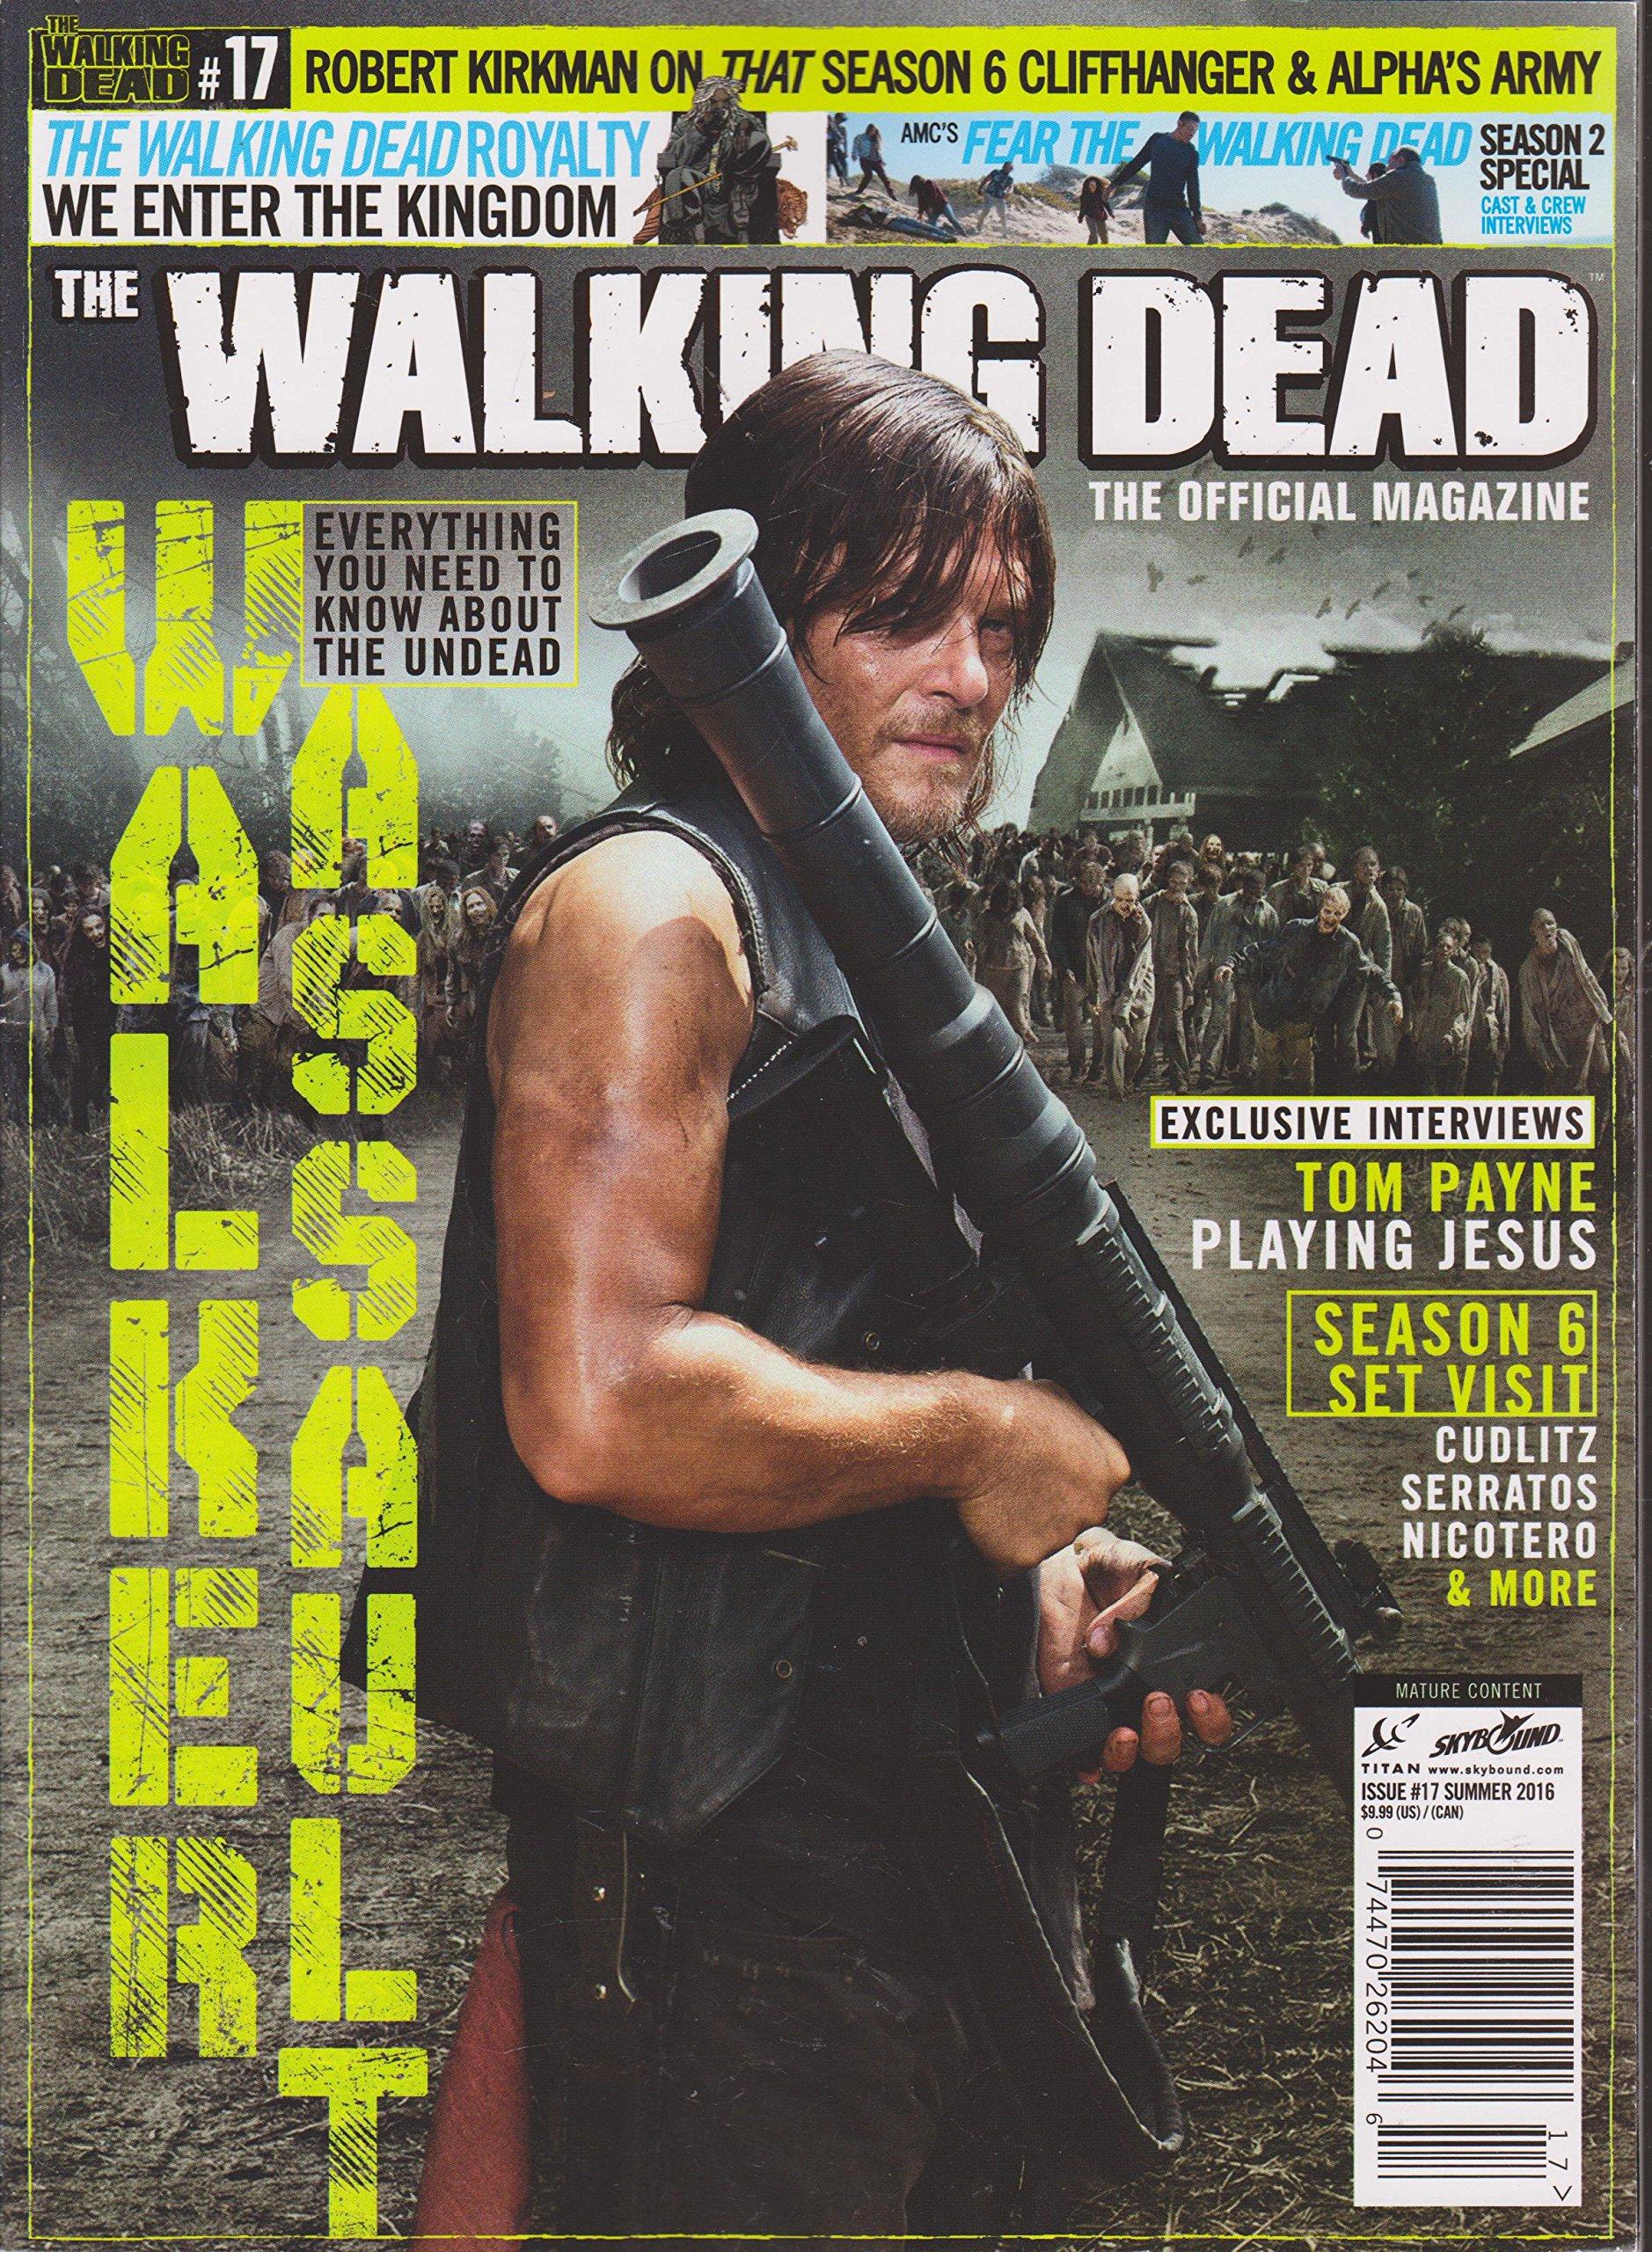 The Walking Dead Magazine Summer 2016 PDF